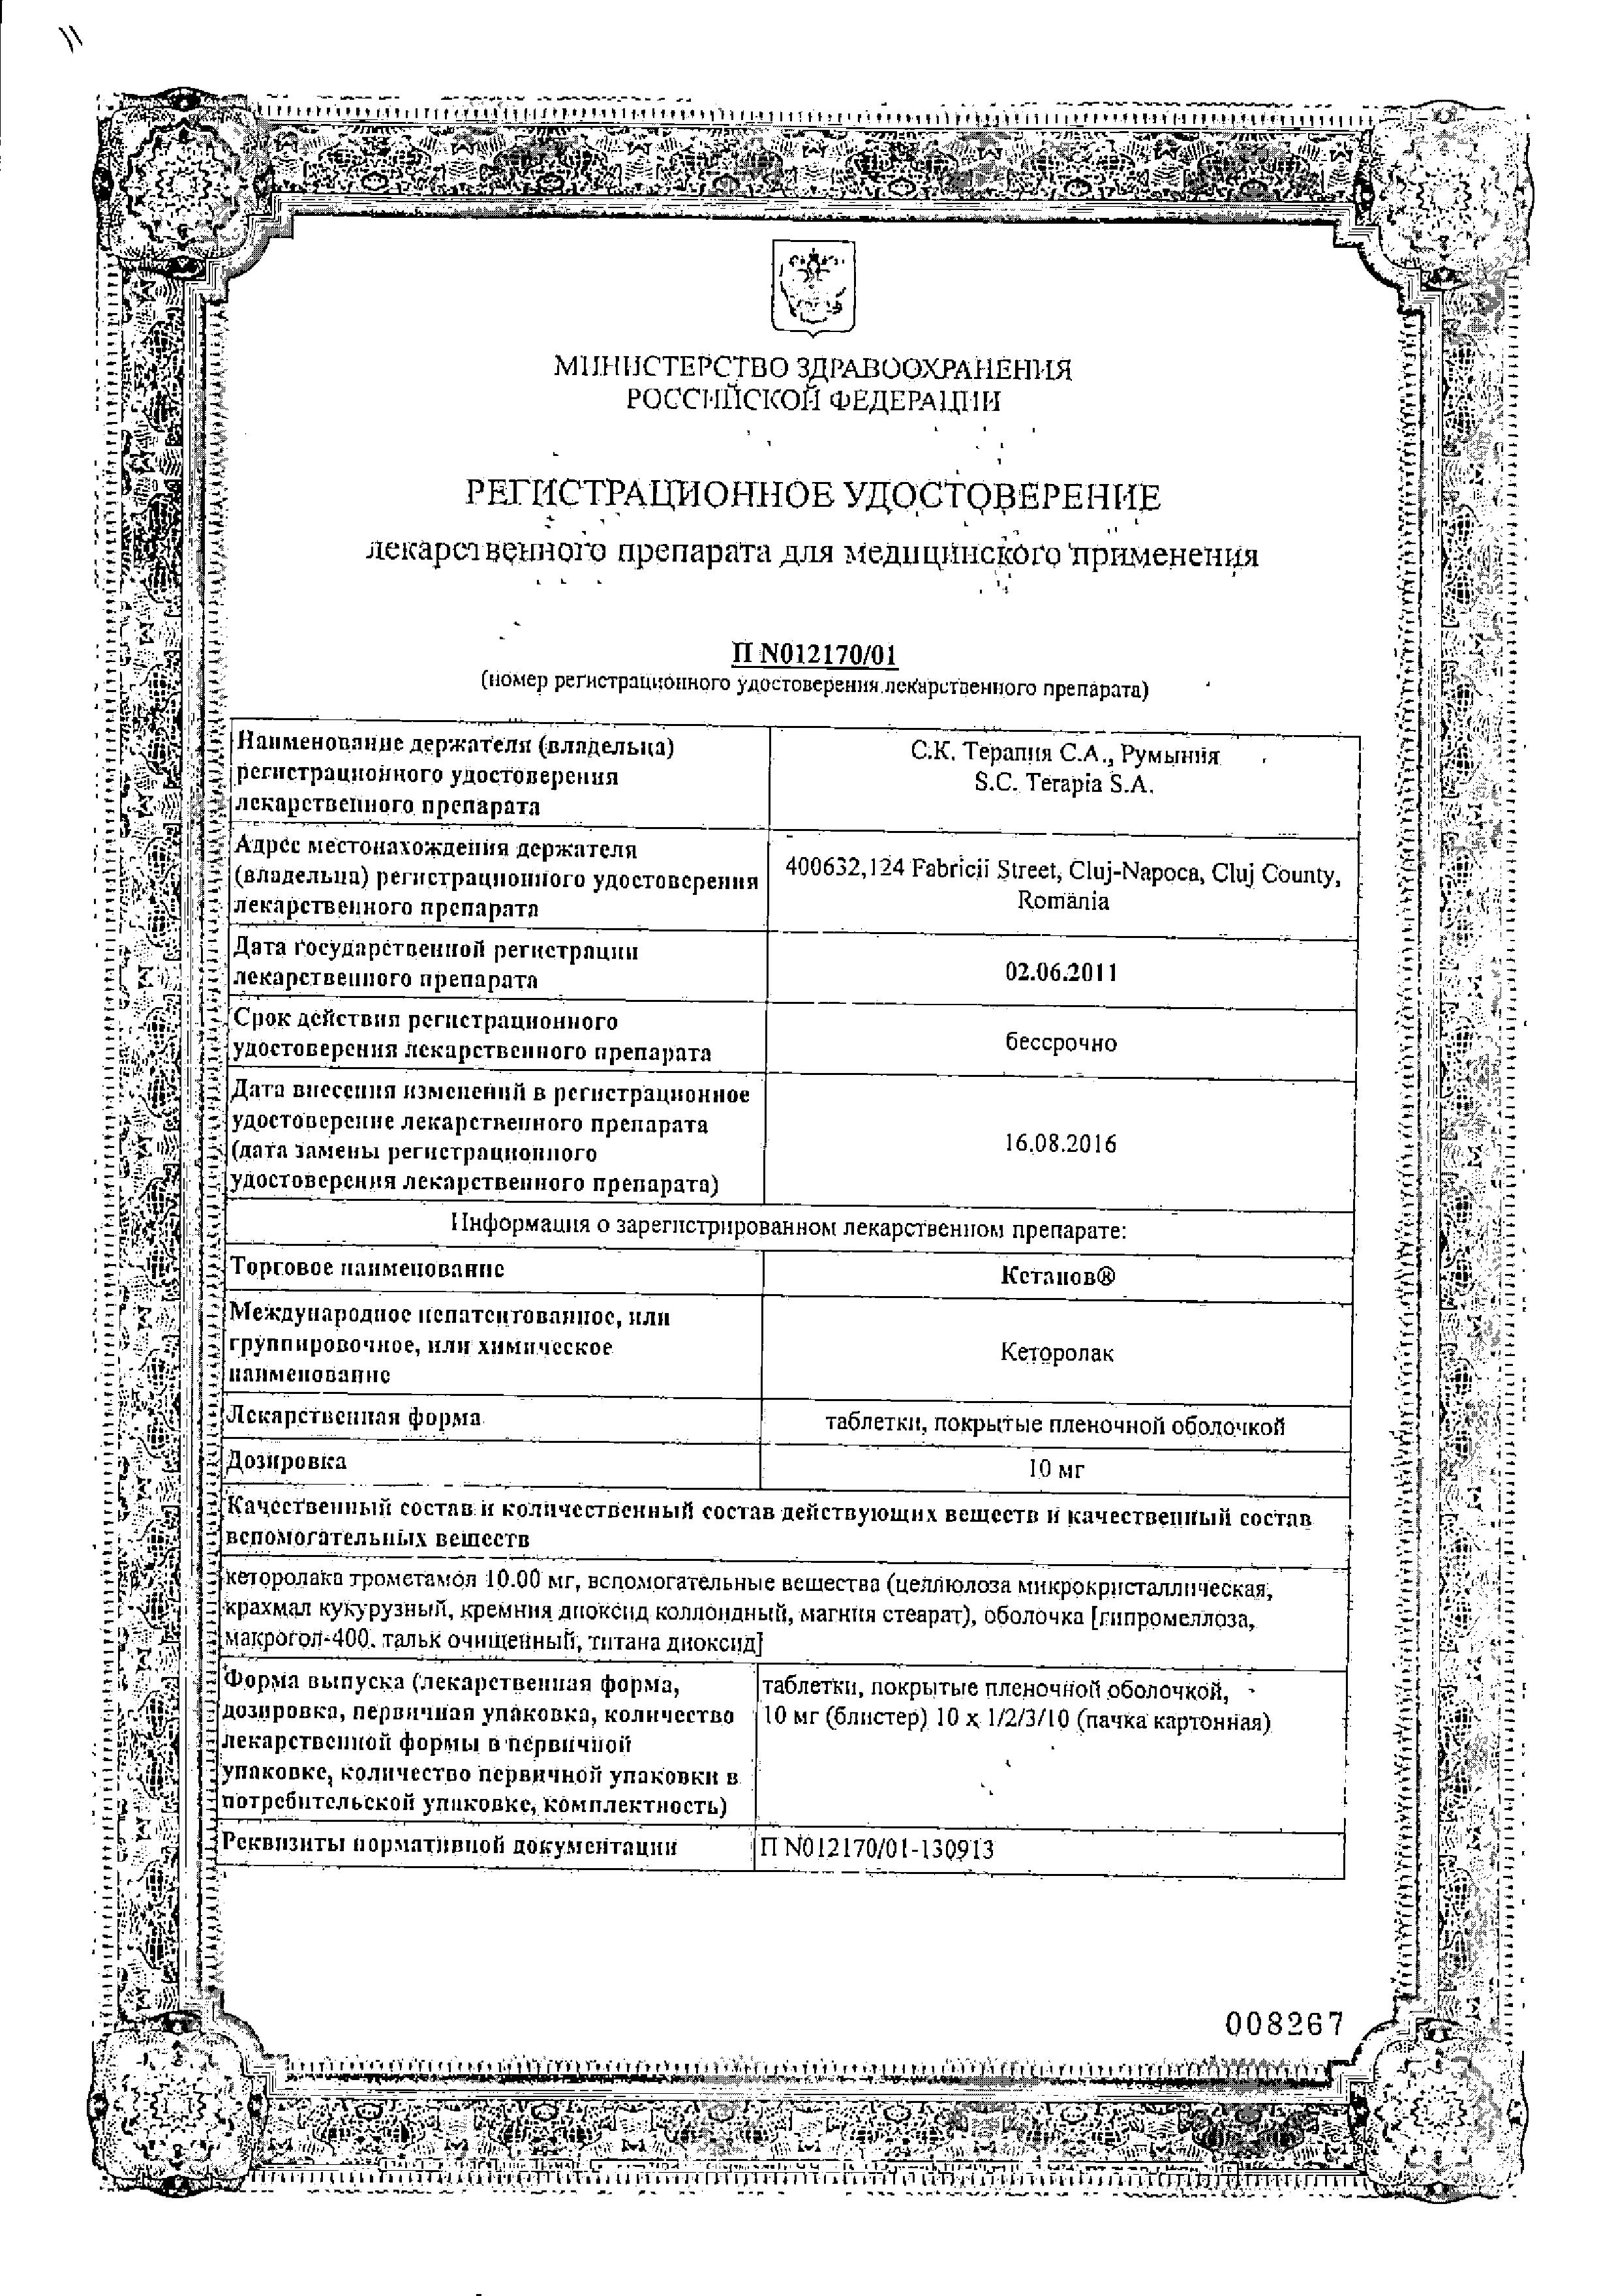 Кетанов сертификат